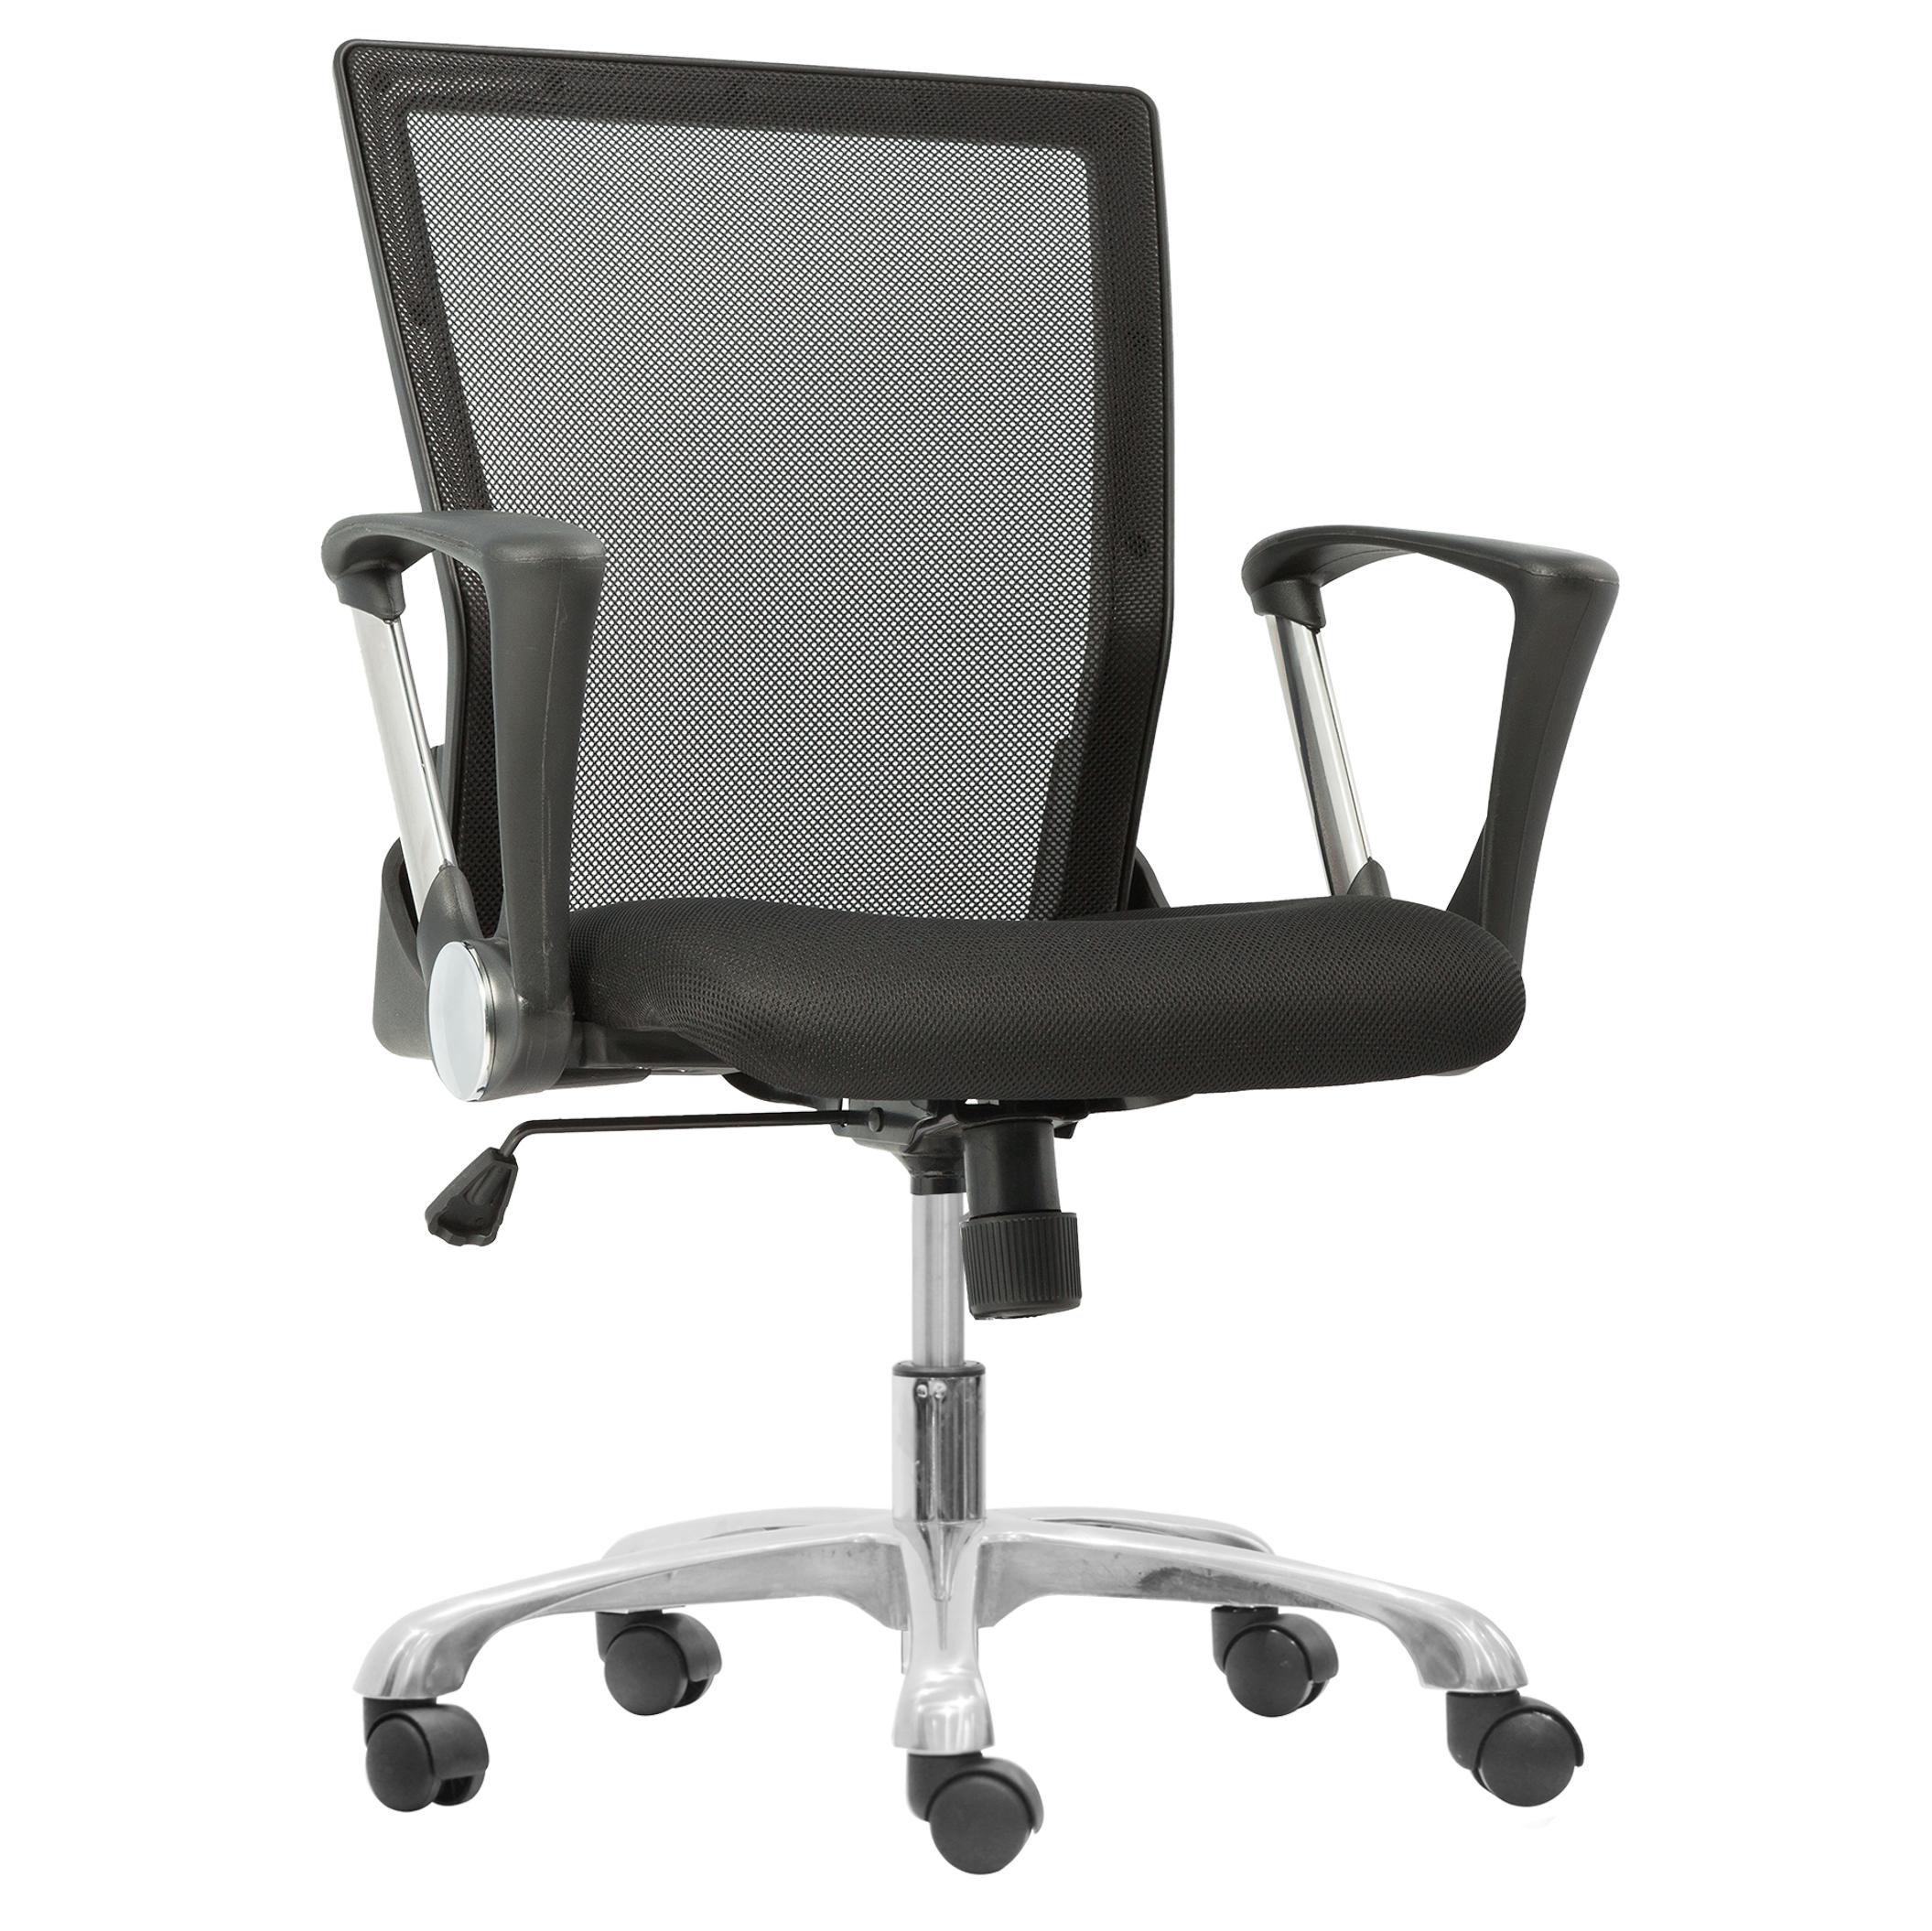 http://workspace.com.vn/danh-muc/ghe-nhan-vien/